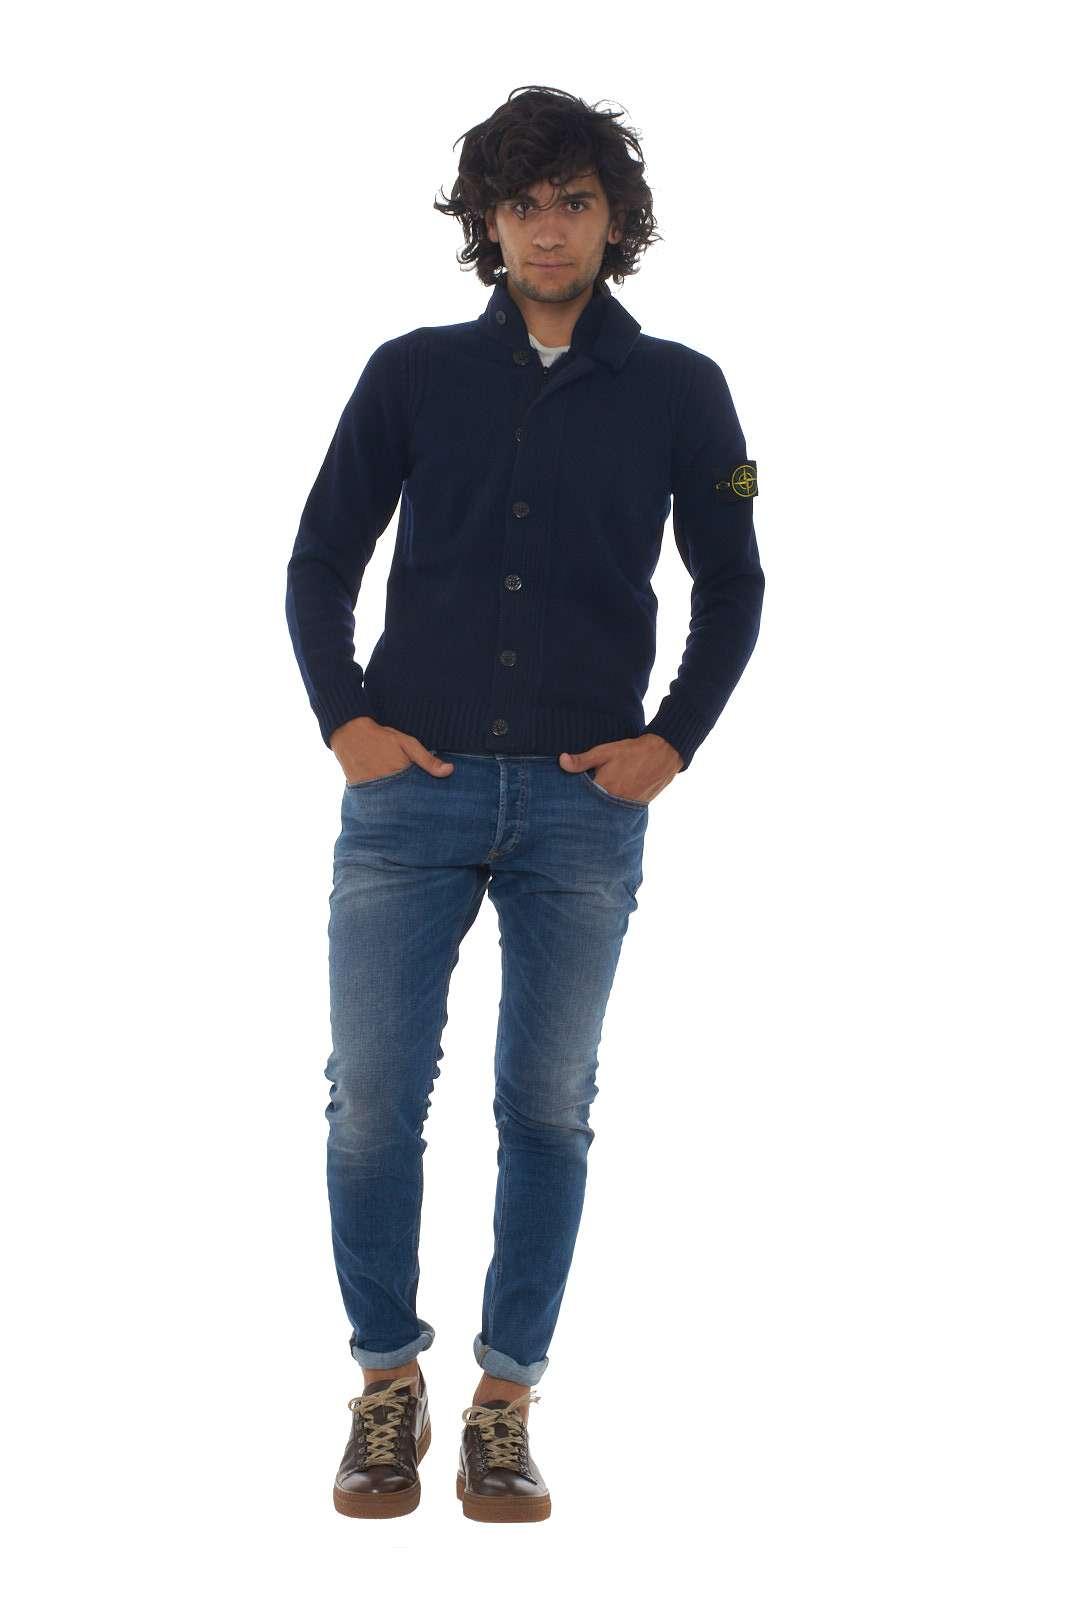 https://www.parmax.com/media/catalog/product/a/i/AI-outlet_parmax-cardigan-uomo-Stone-Island-7115564A3-D.jpg